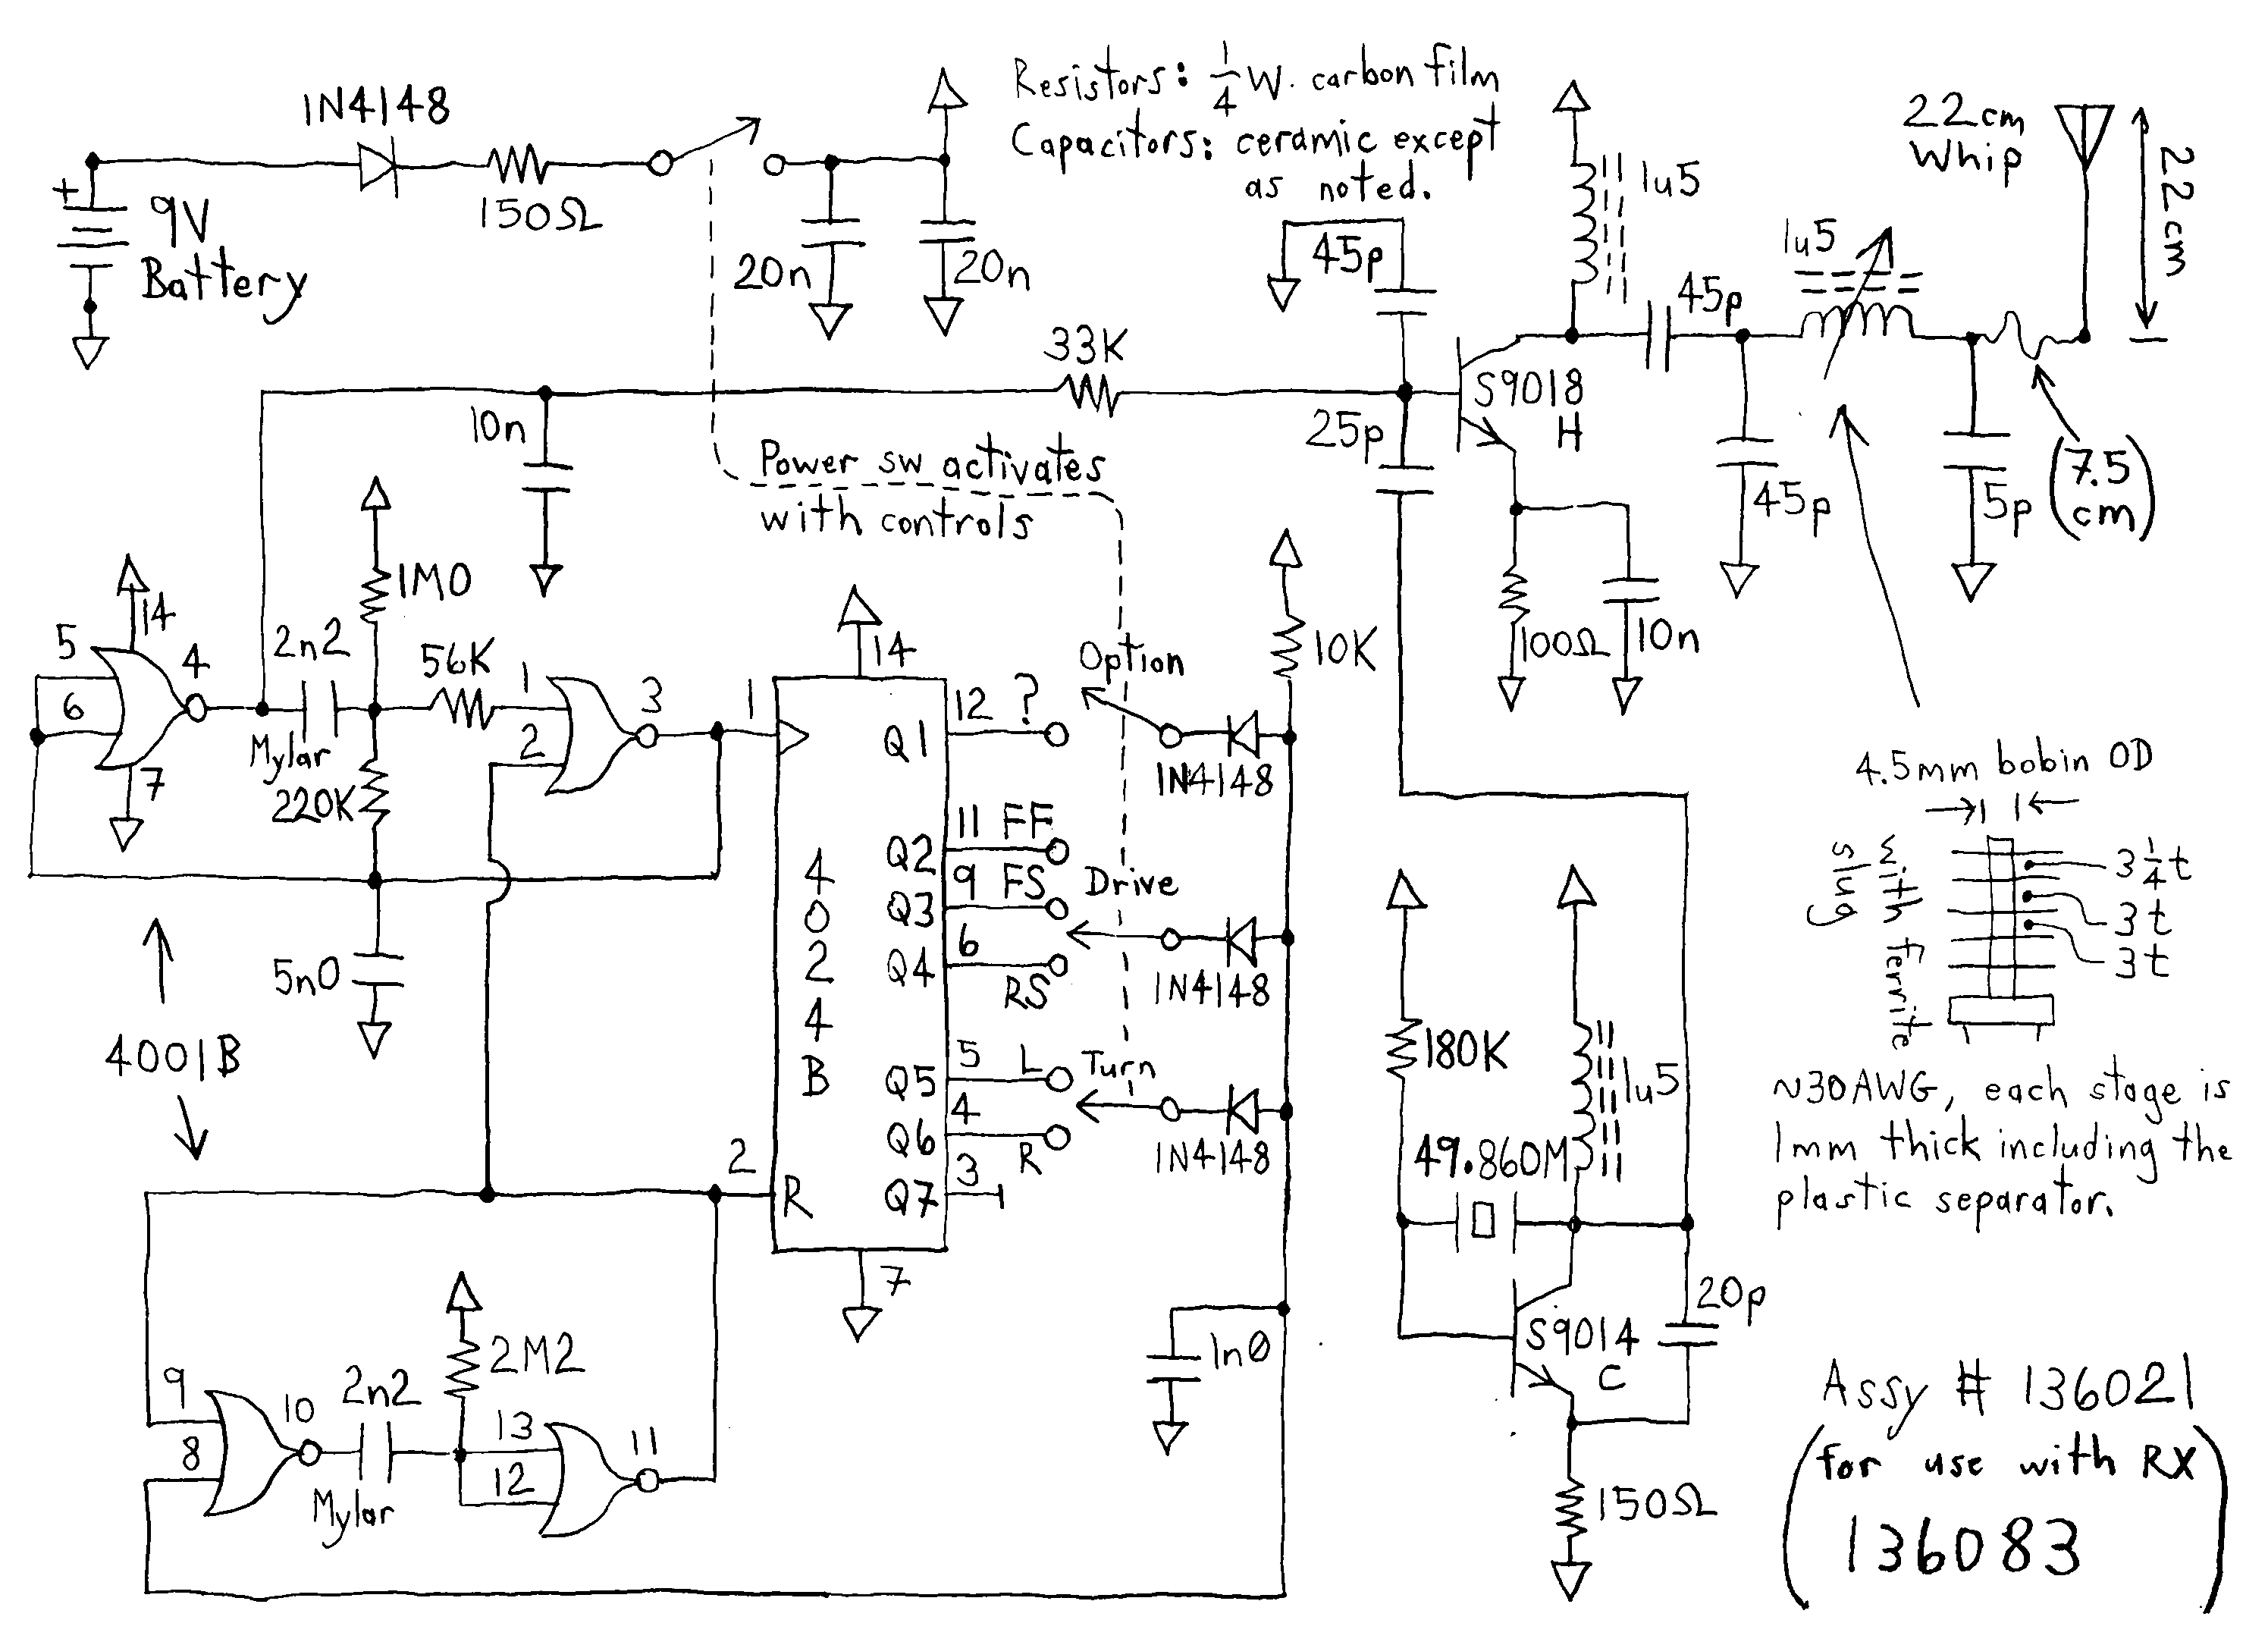 redcat wiring diagram for remote car wiring free printable wiring diagrams